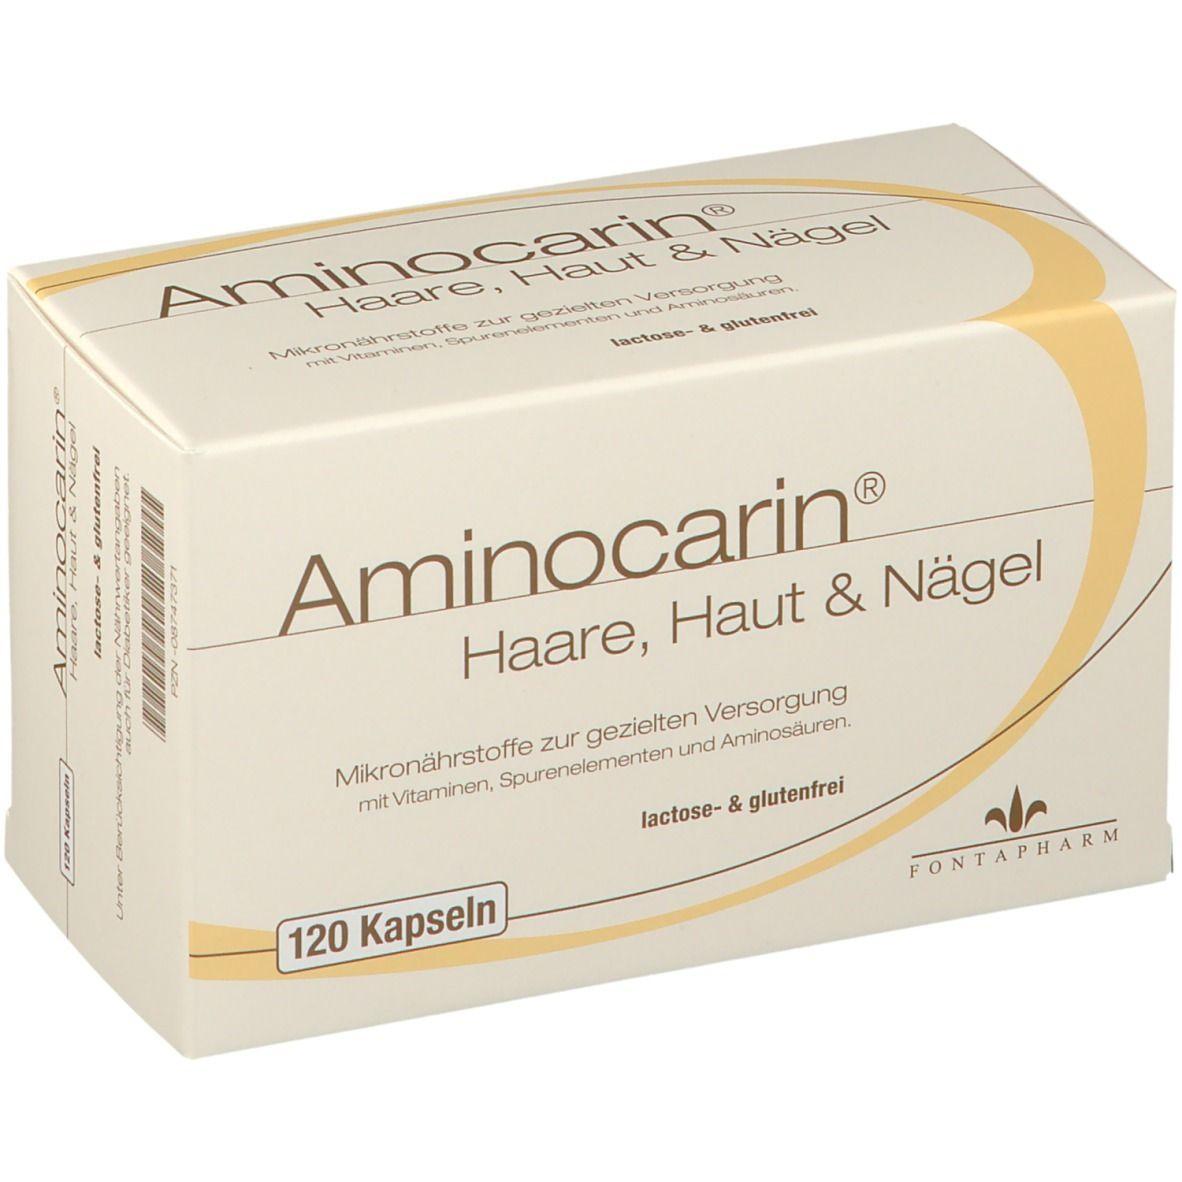 Image of Aminocarin® Kapseln